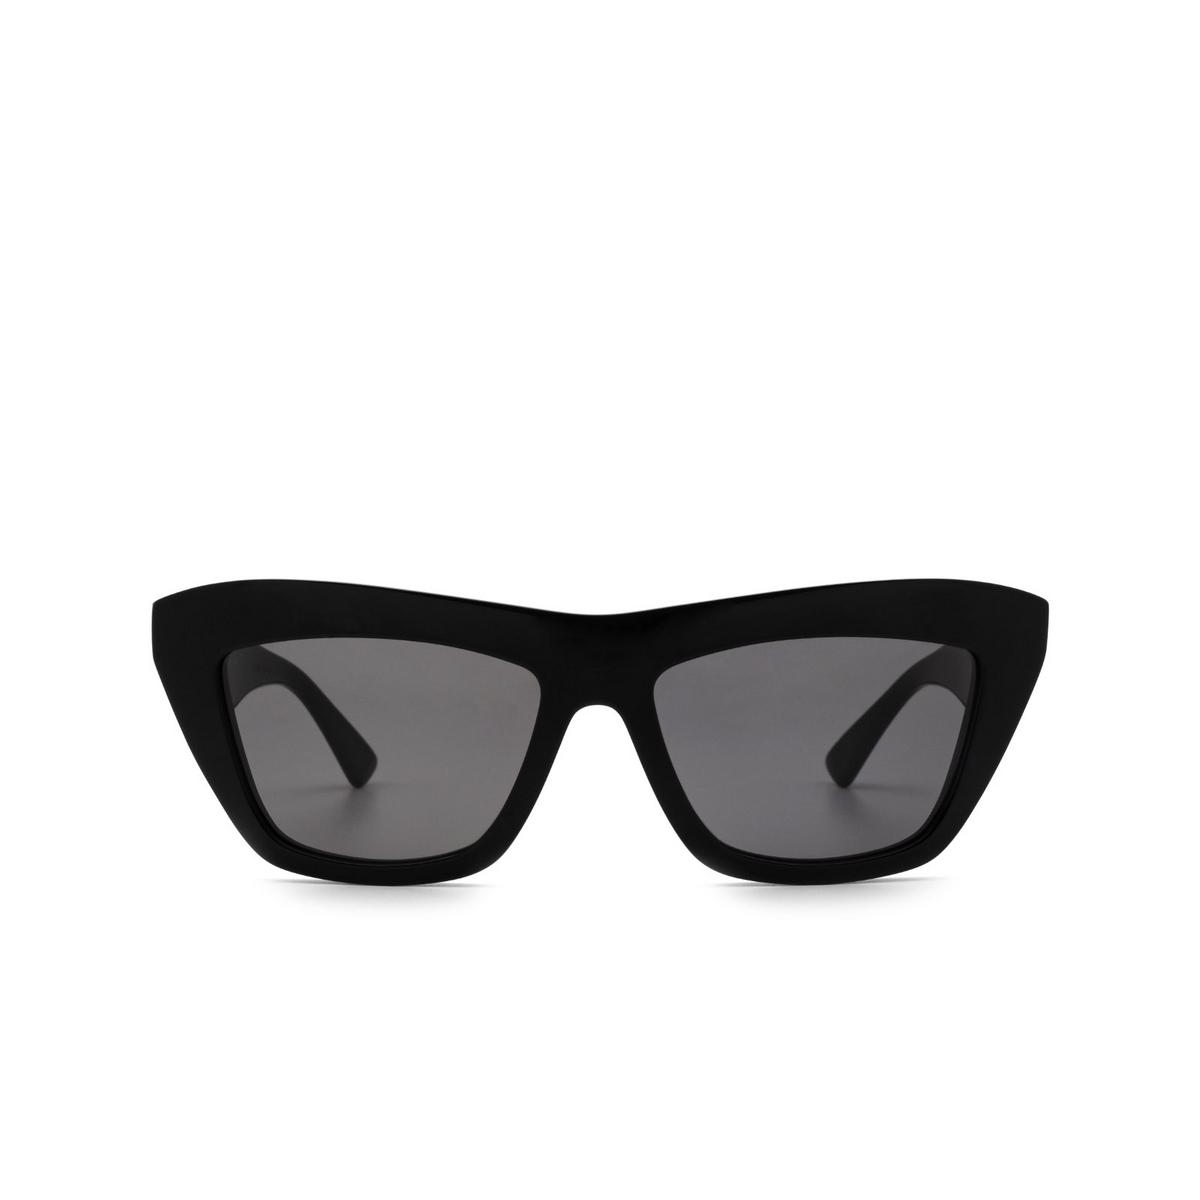 Bottega Veneta® Cat-eye Sunglasses: BV1121S color Black 001 - front view.